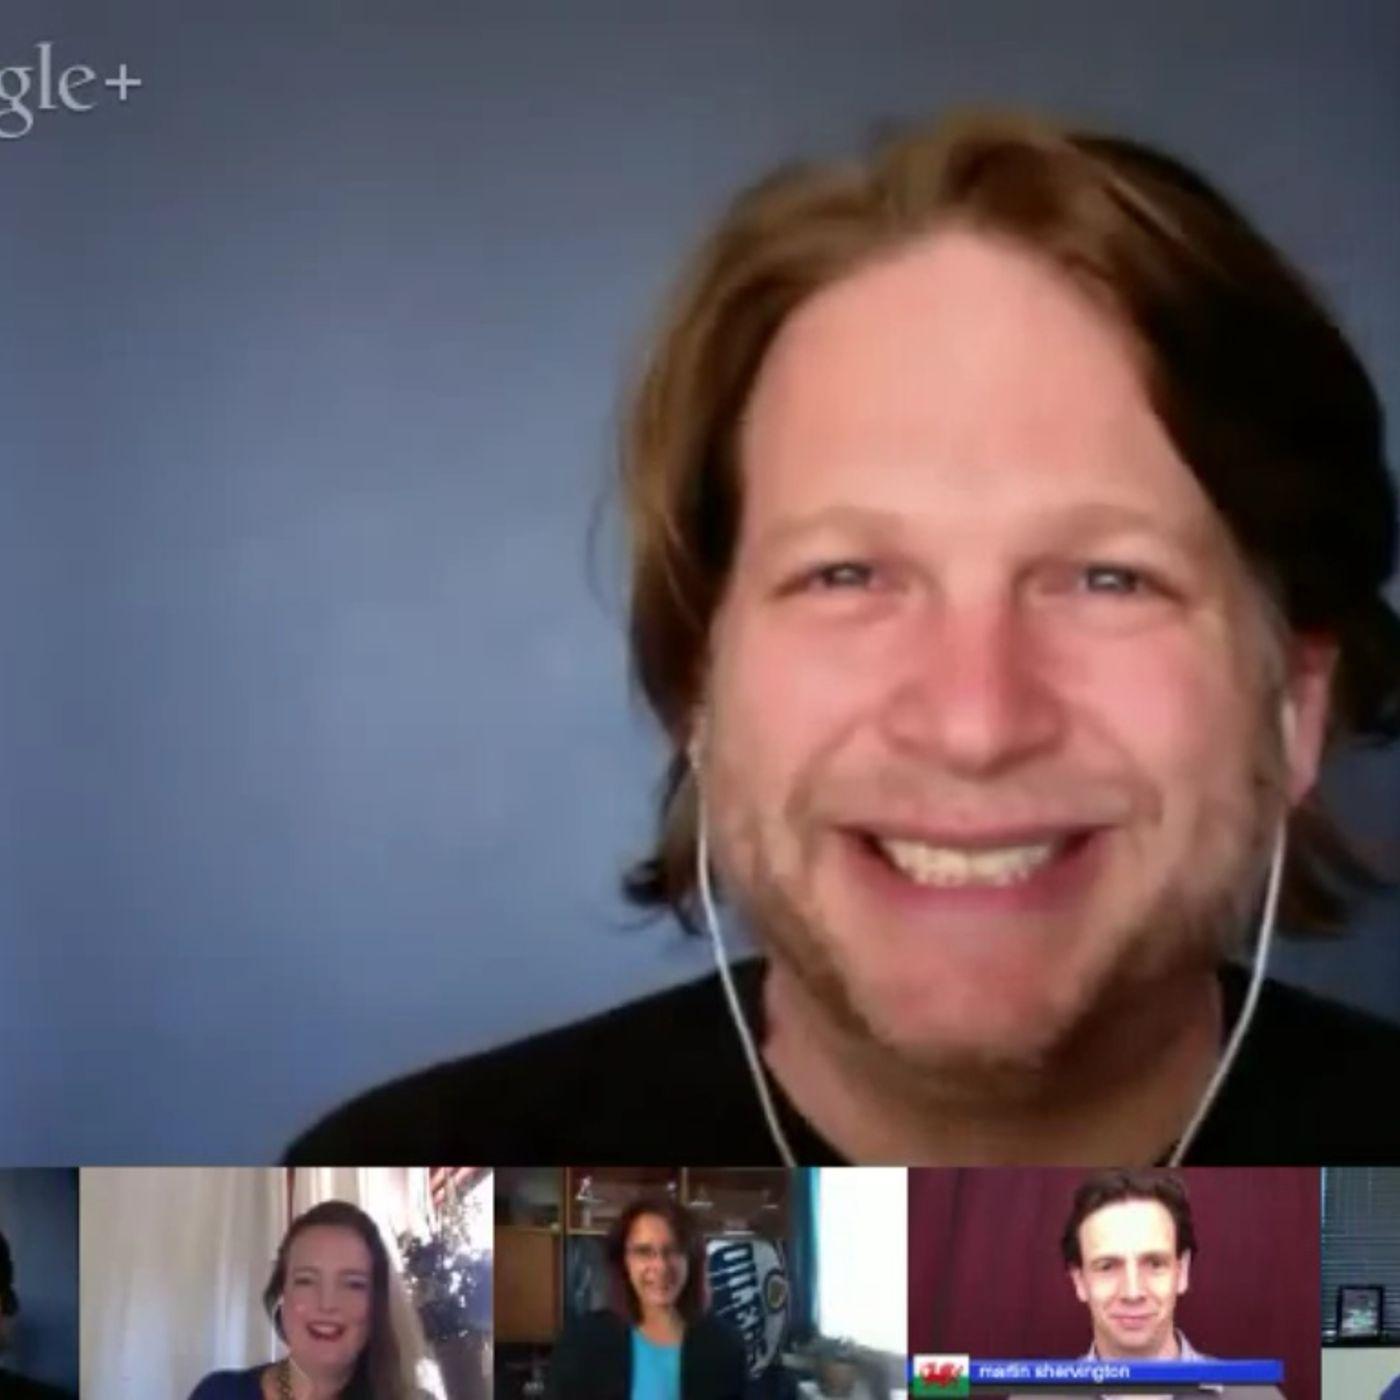 Chris Brogan and balancing technology and harmony in life